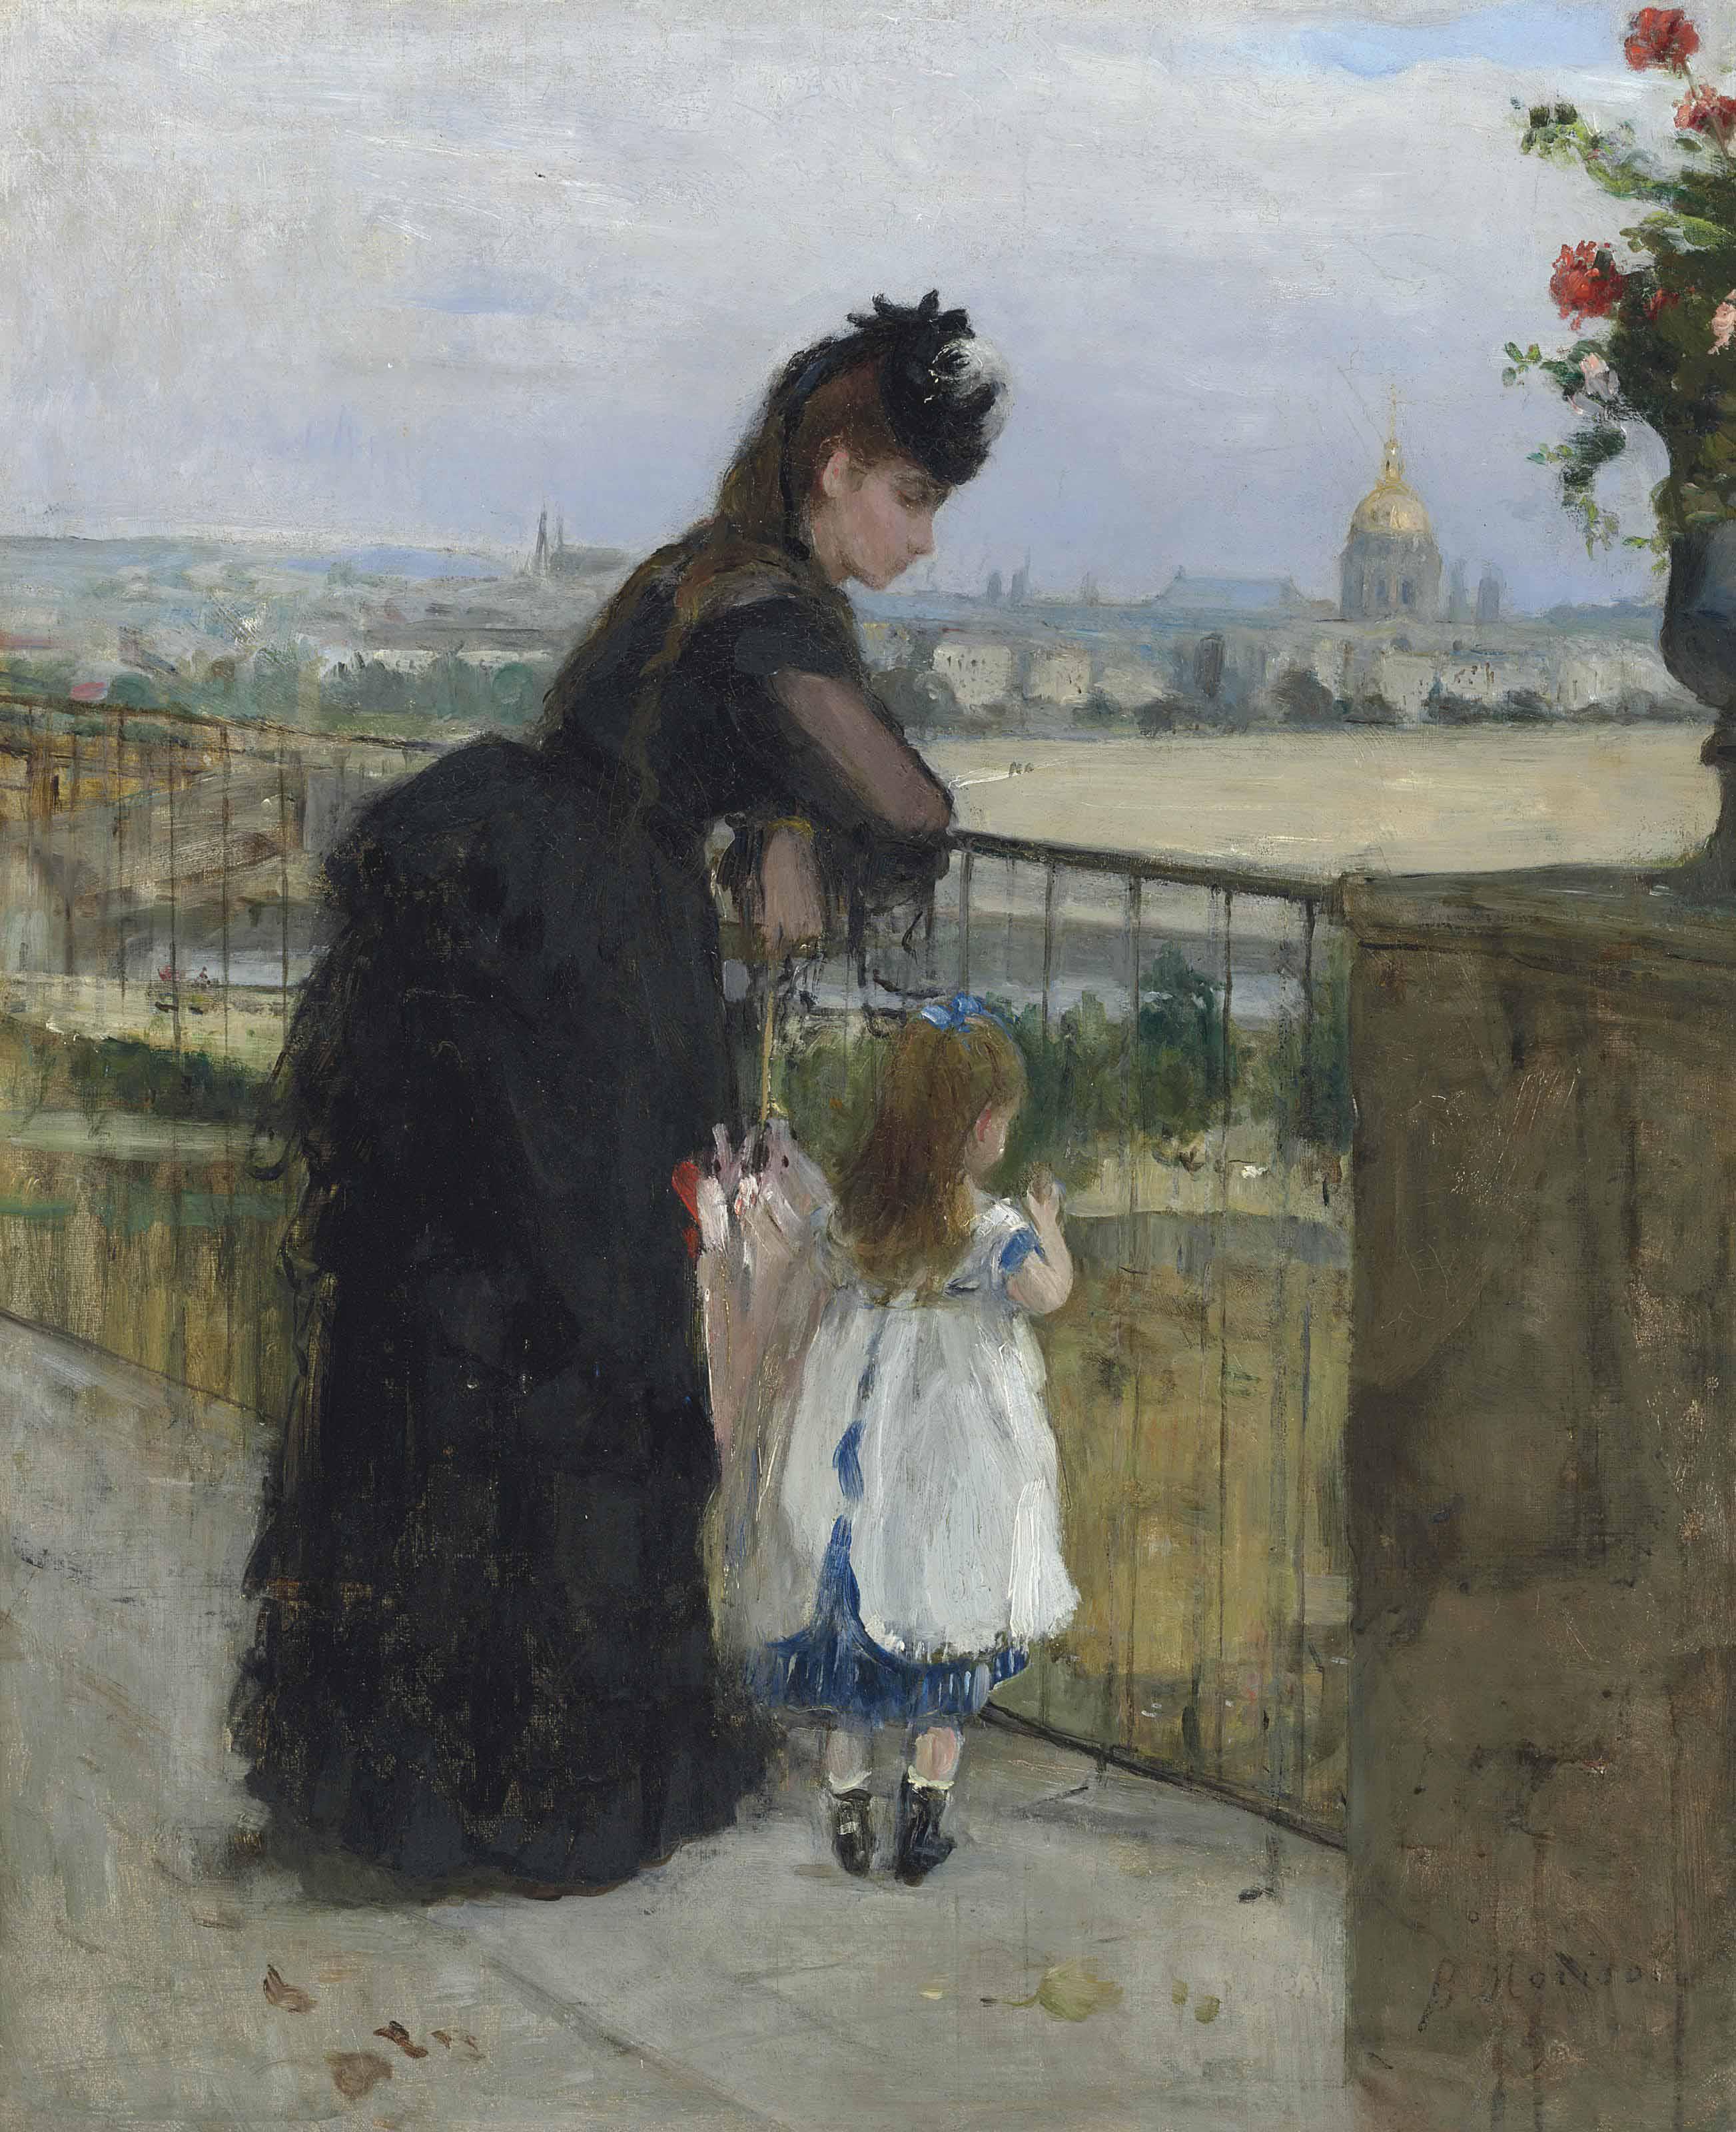 Berthe Morisot (1841-1895)